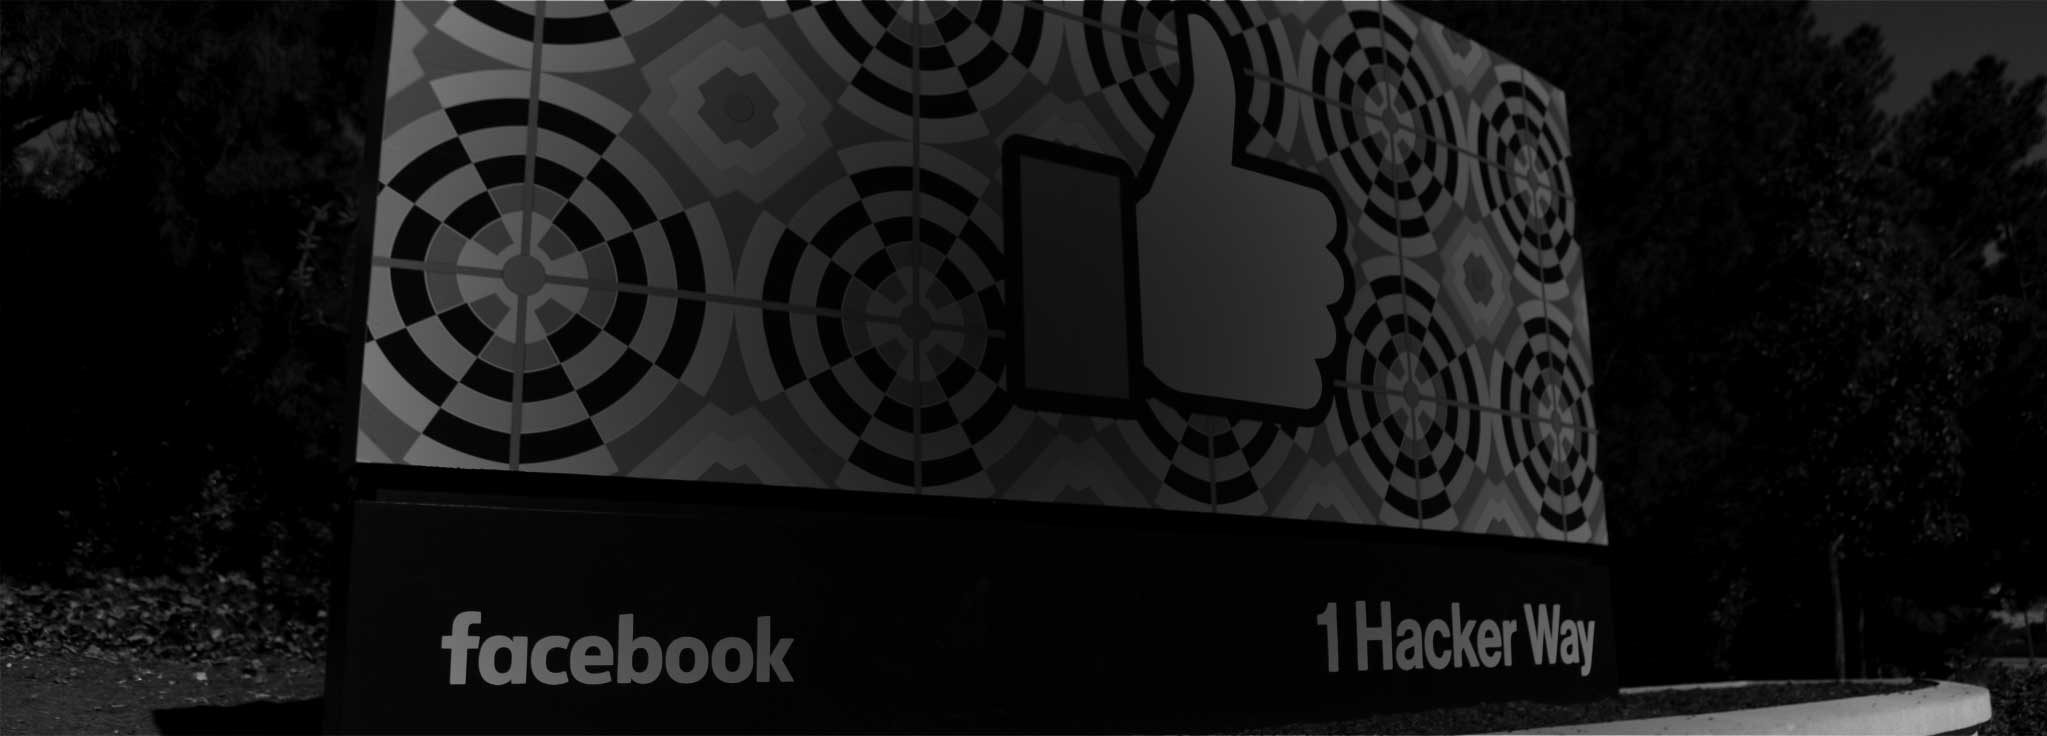 facebook-workplace-sign.jpg